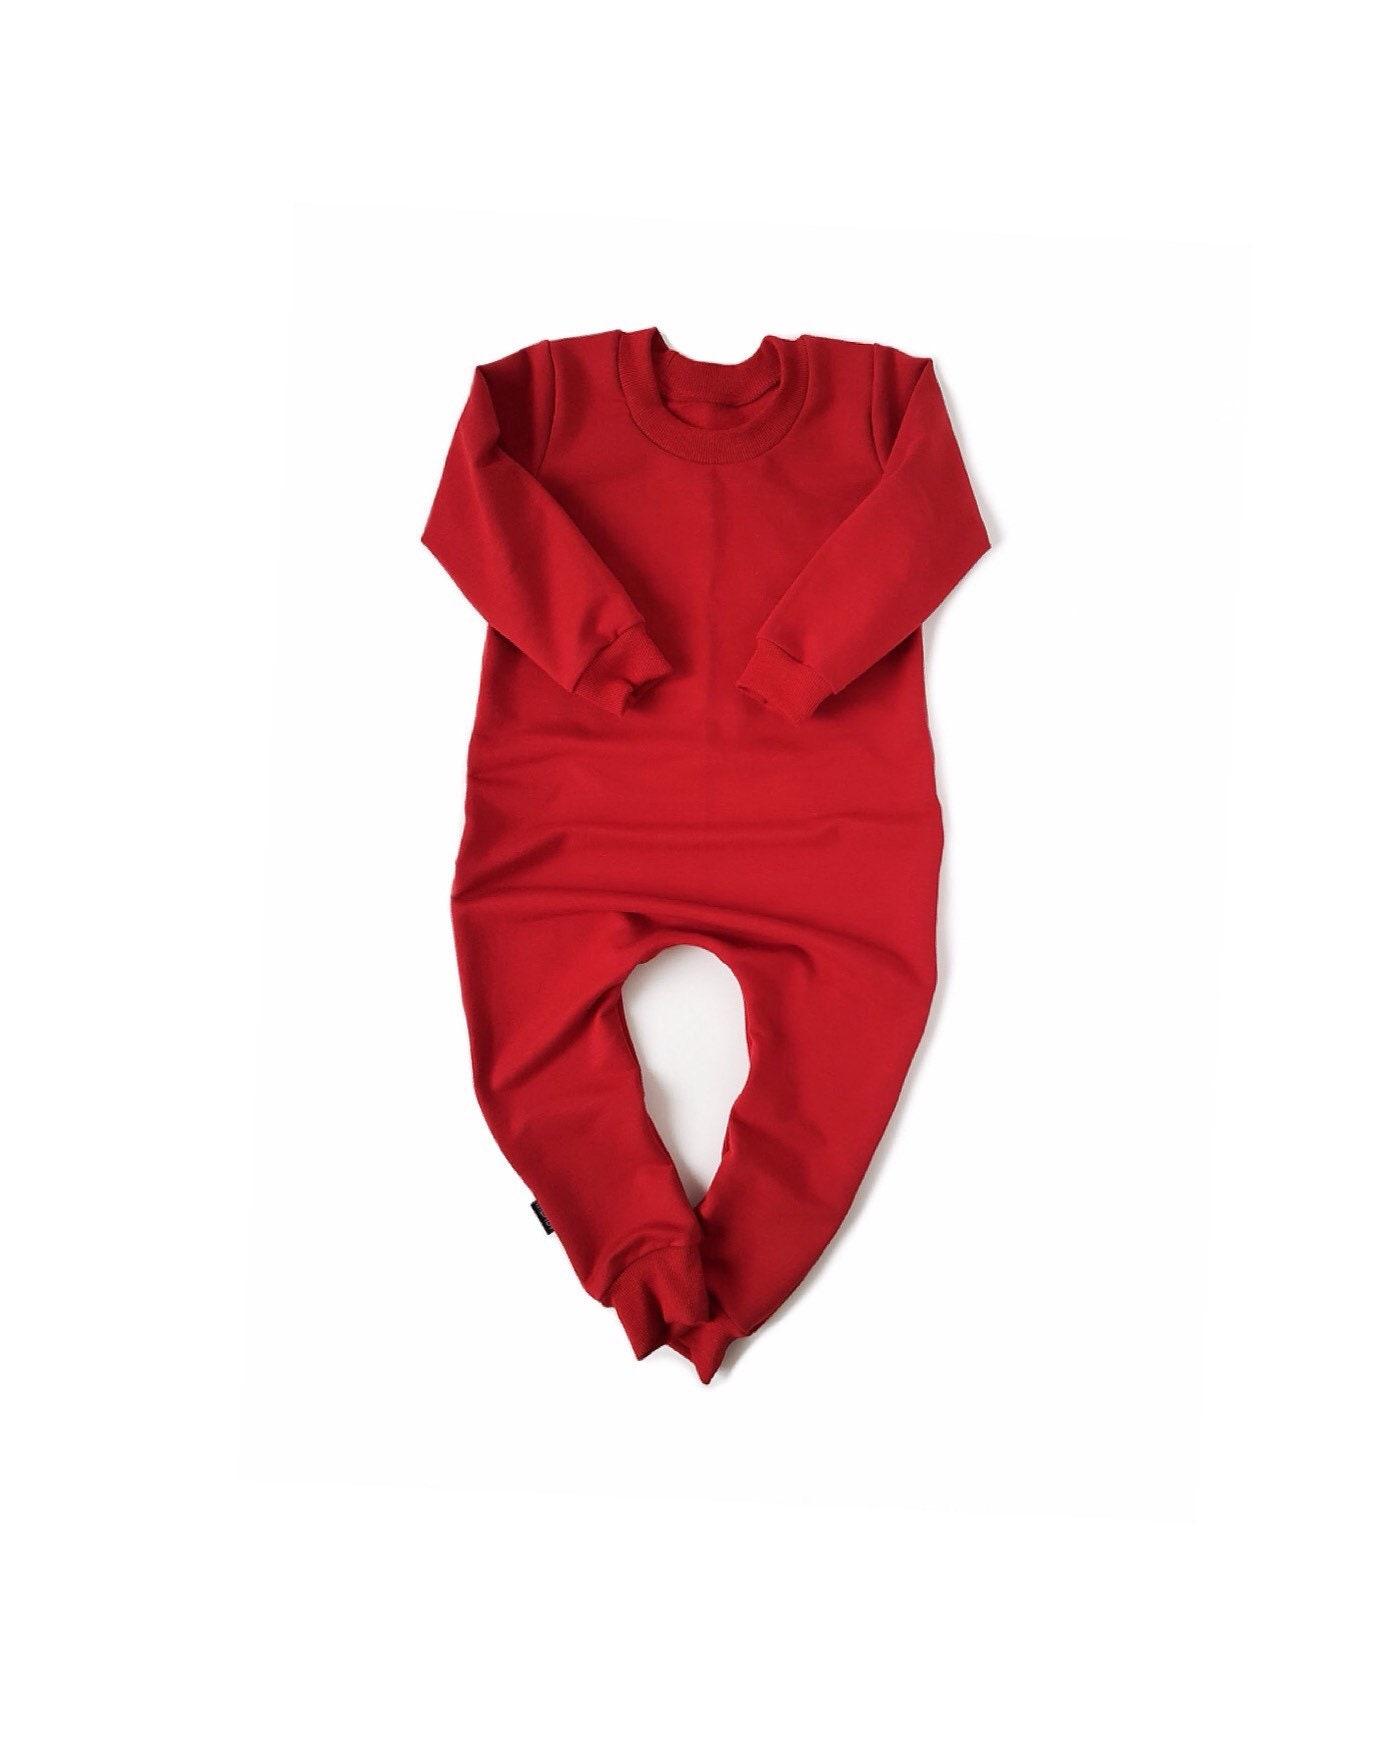 5524ec69618 RED Baby Romper   Toddler Romper One Piece Sweatshirt Jumpsuit ...